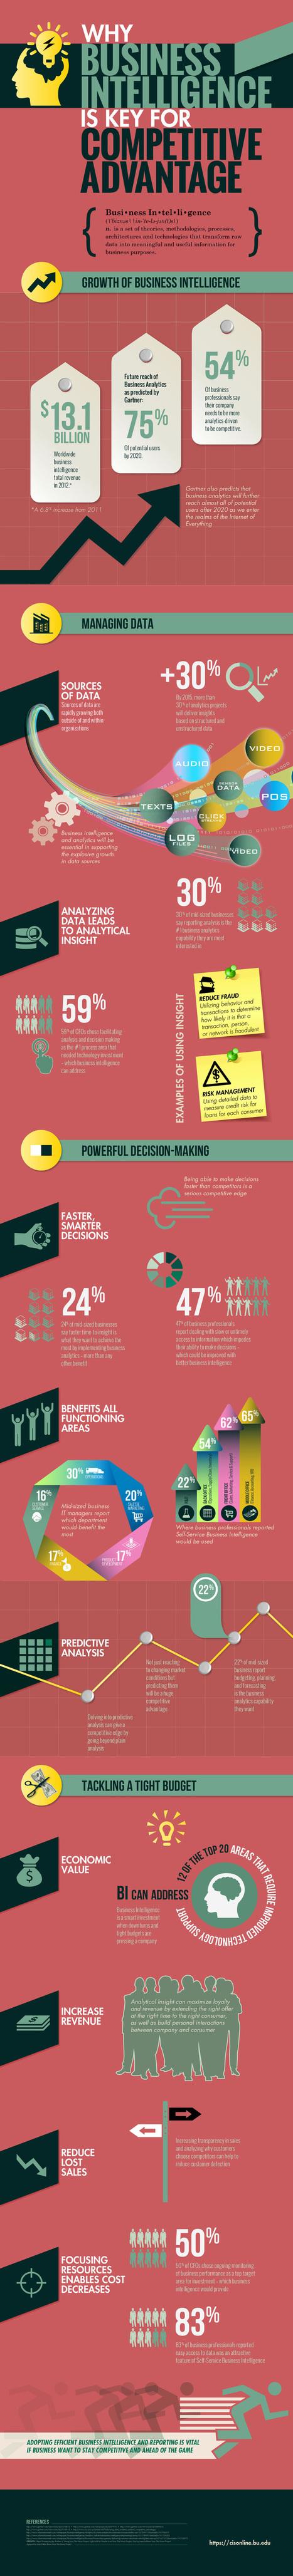 Why Business Intelligence Is Essential   General Information & Digital Marketing   Scoop.it